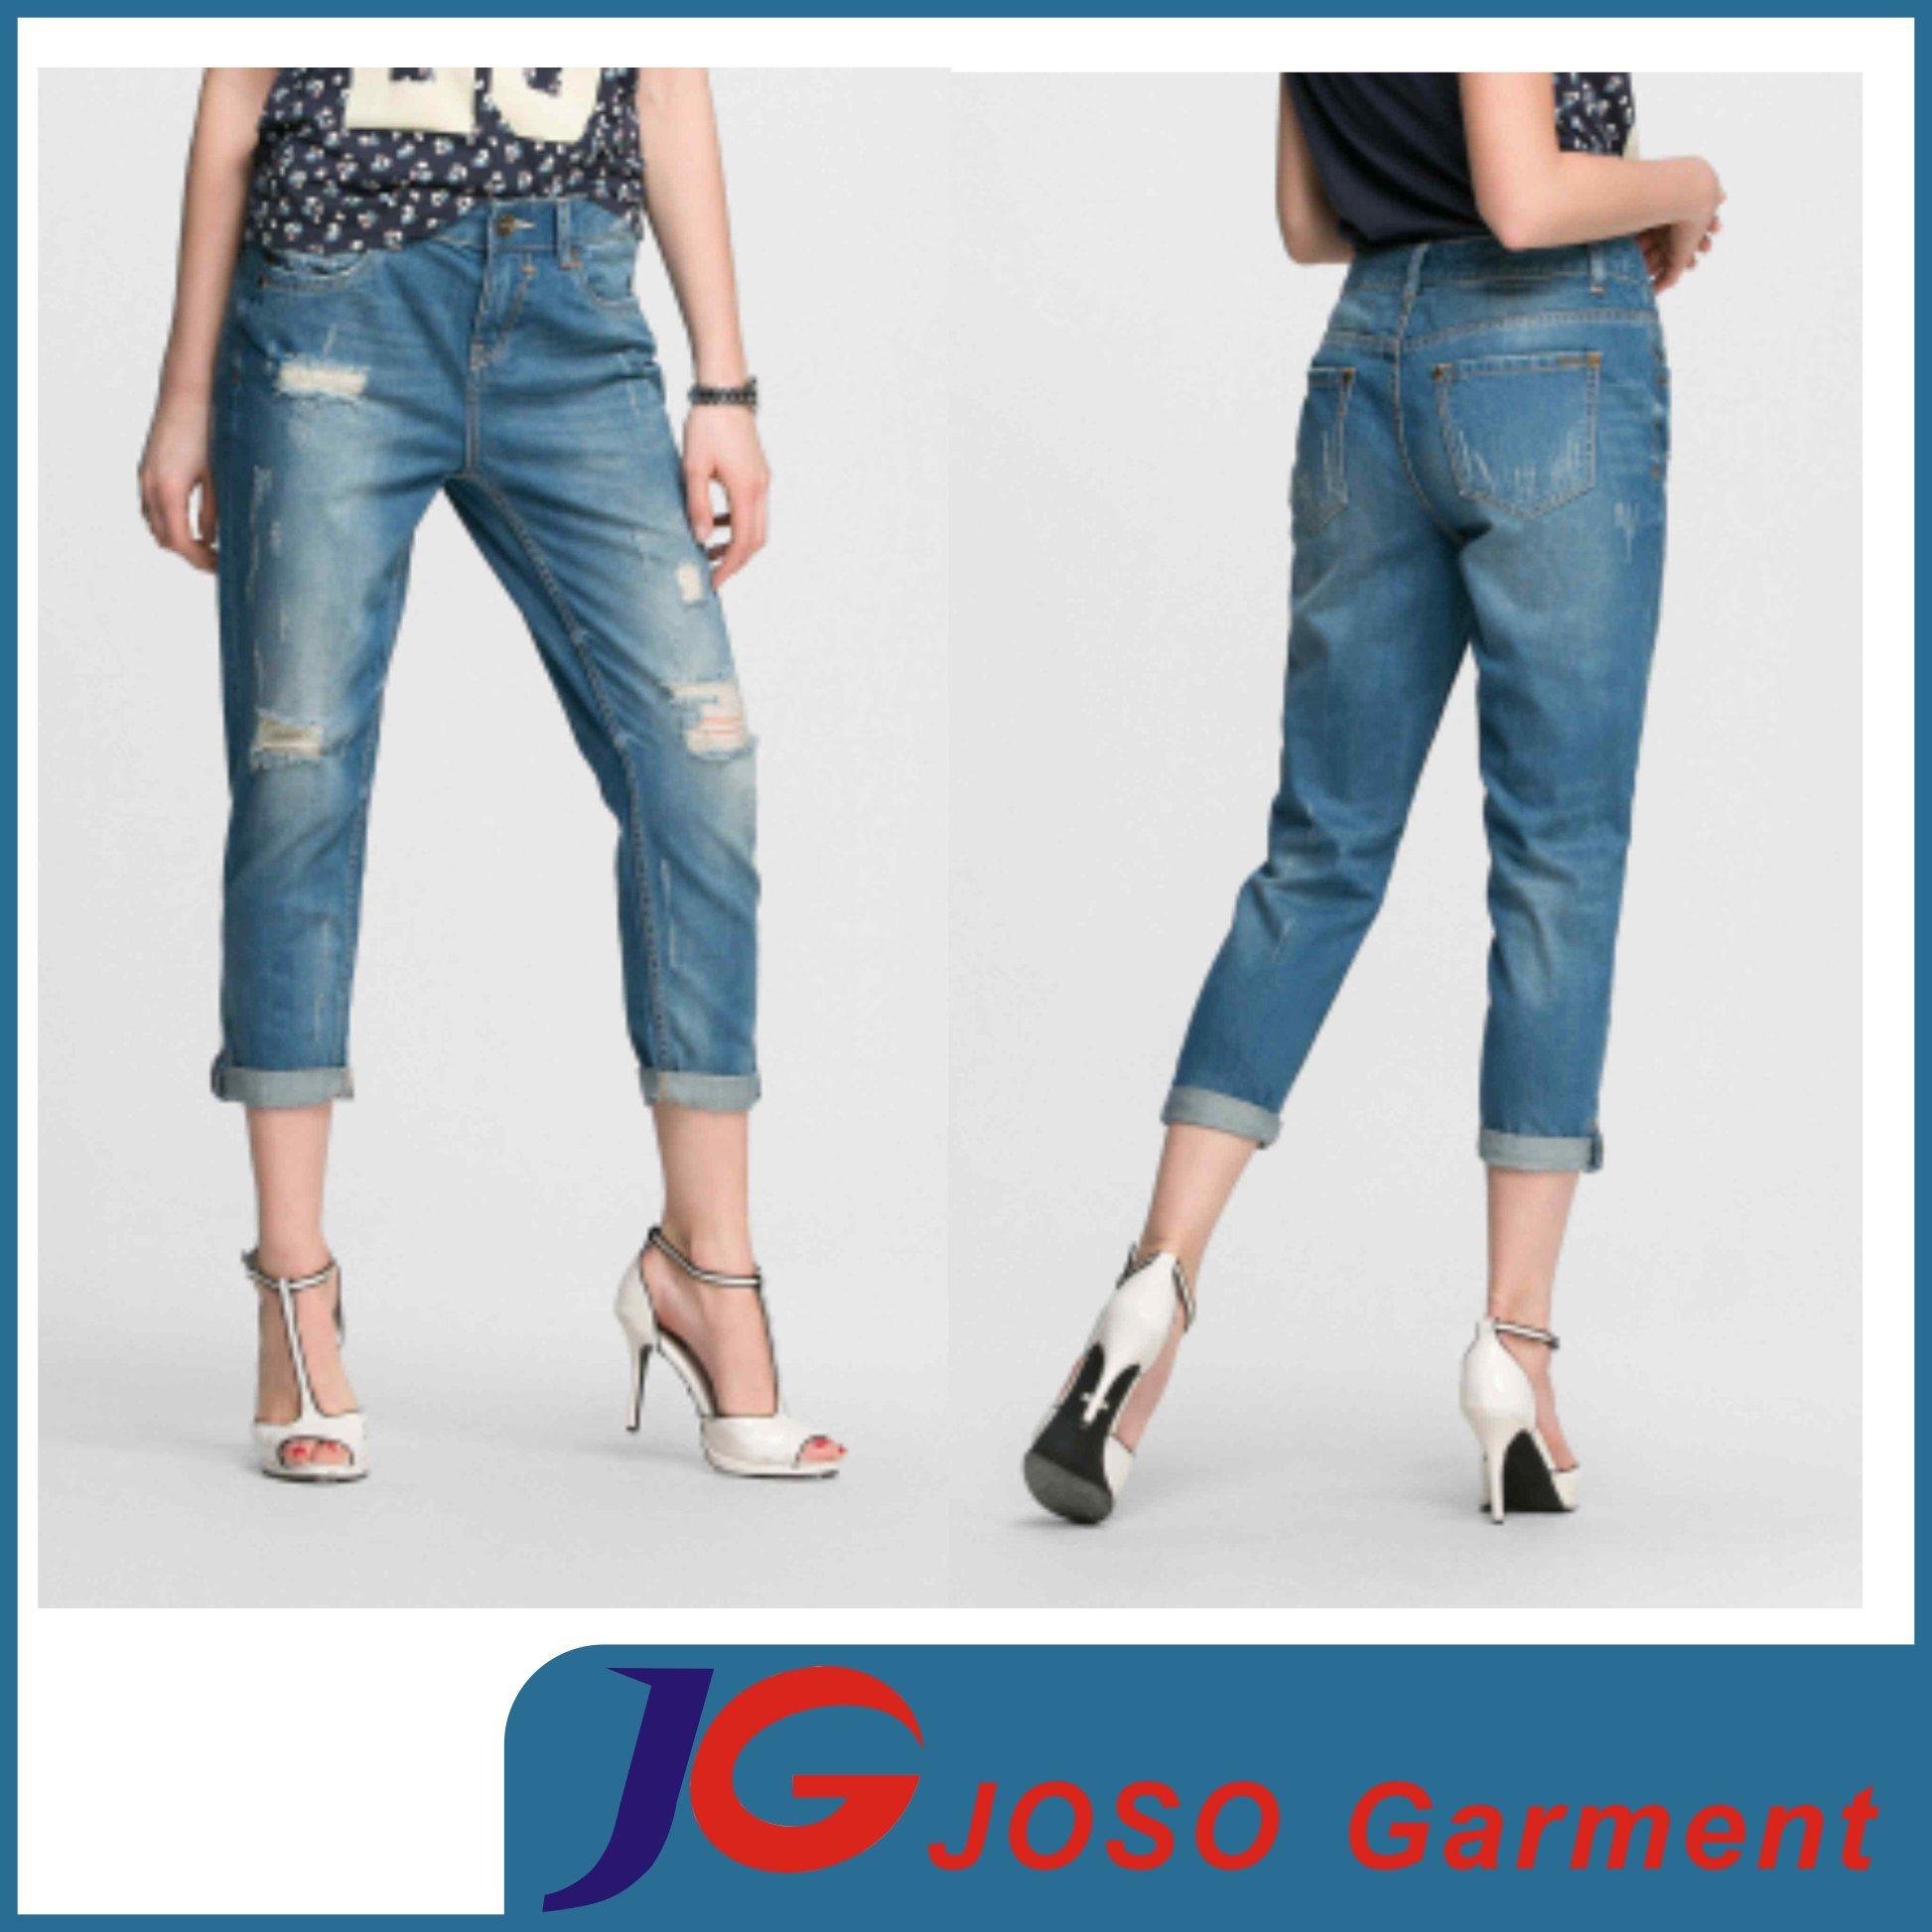 55f5d17df Mulheres calças de ganga Senhora Jeans Loja on-line Cufled Jean (JC1361)